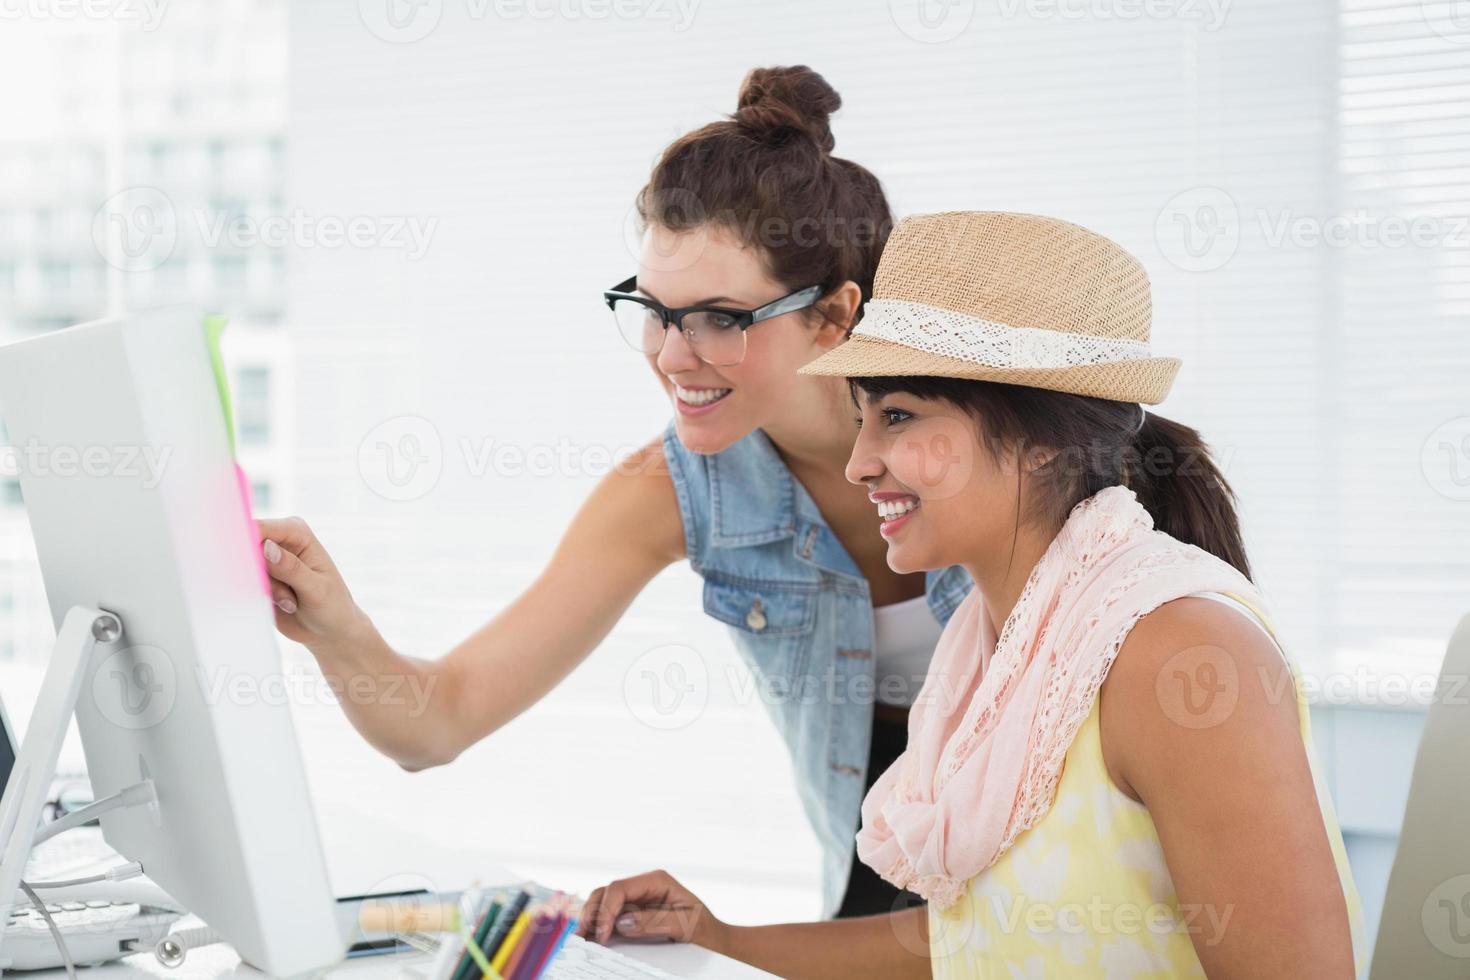 le lagarbete som pekar datorn vid skrivbordet foto